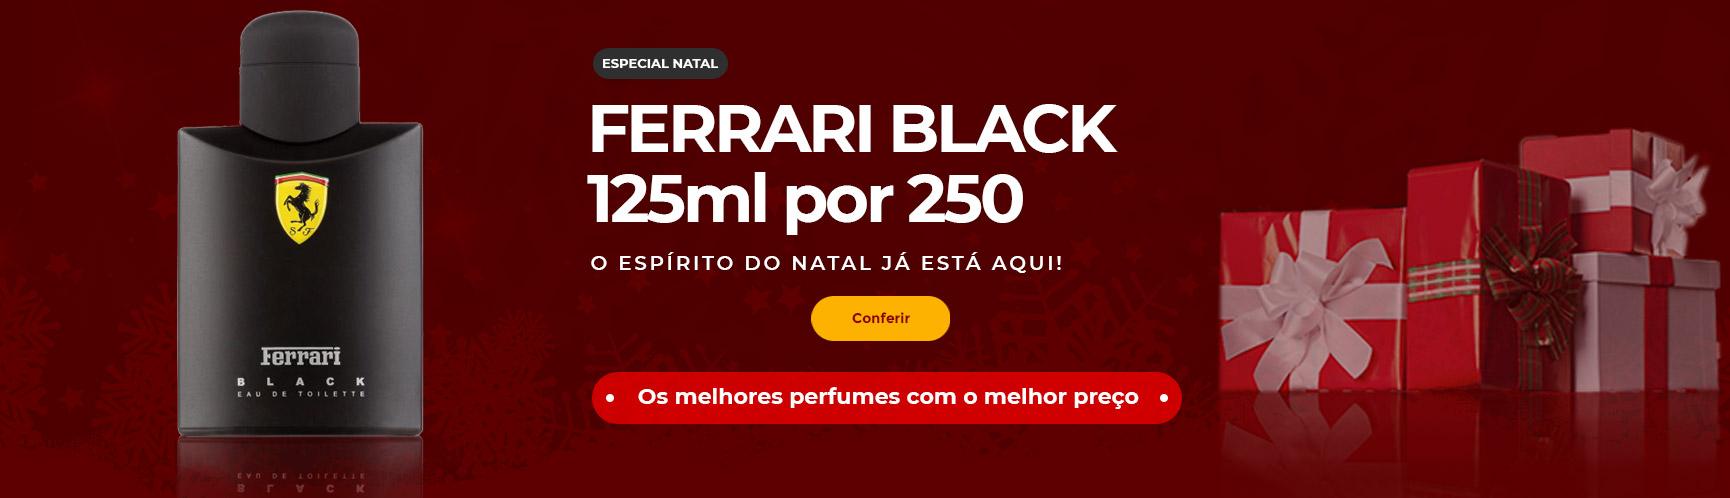 FERRARI BLACK